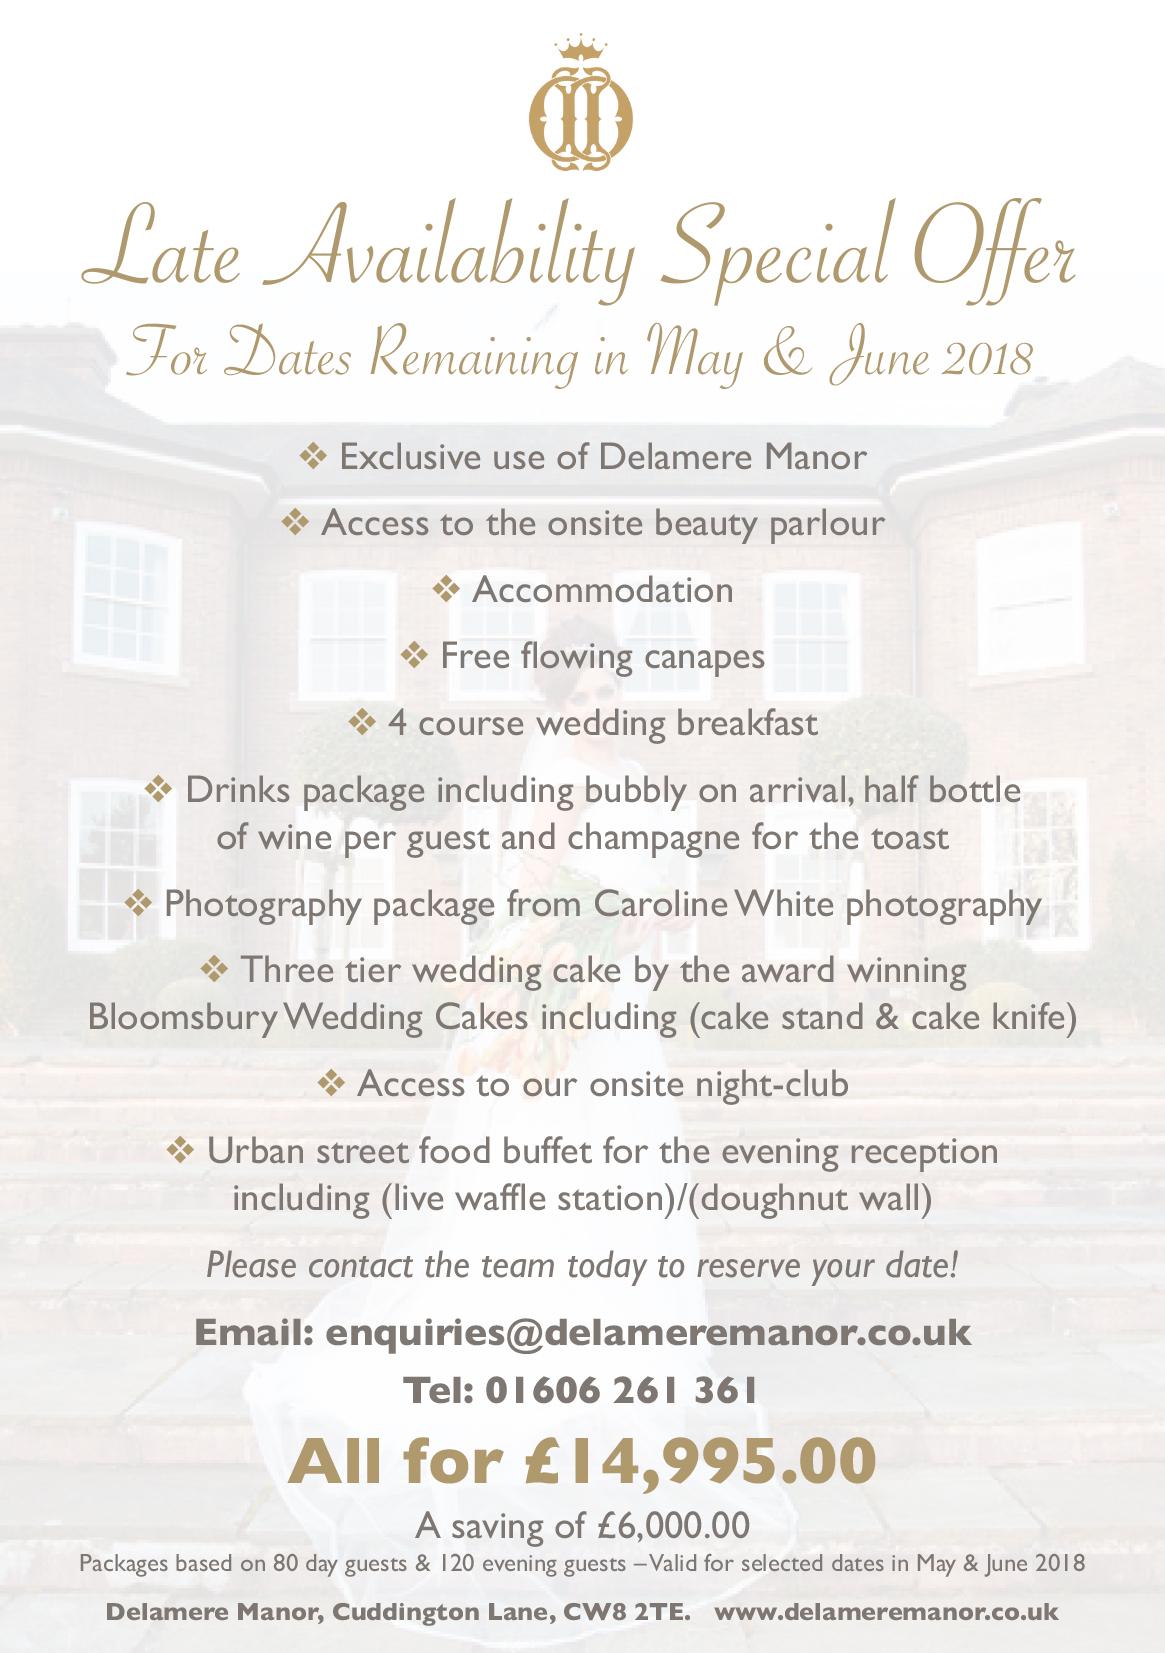 Cheshire Wedding Venue offer